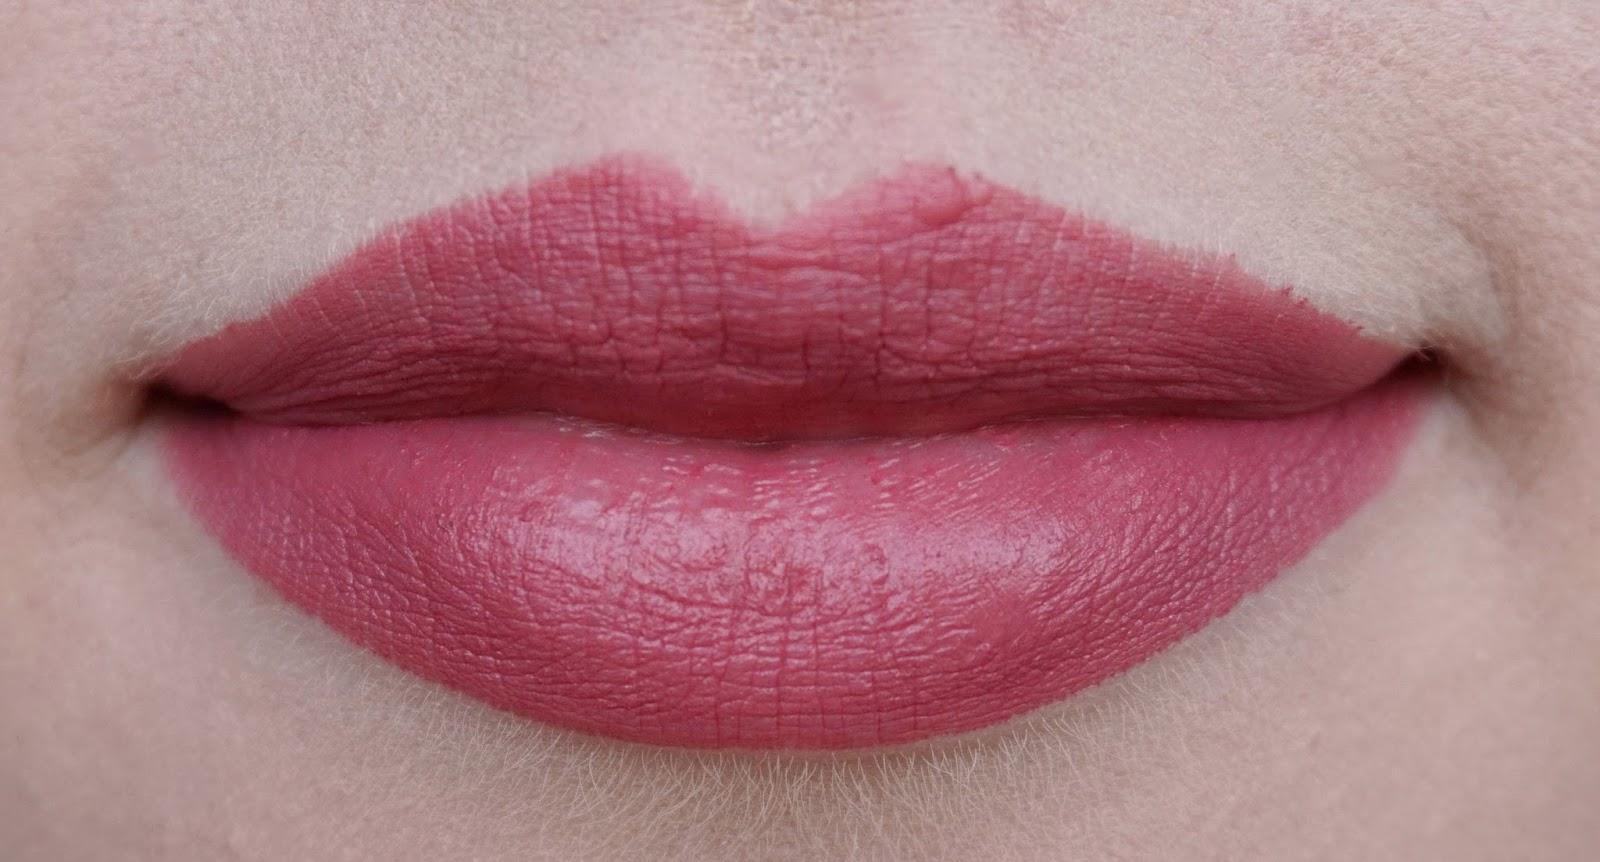 charlotte tilbury hot lips lipstick secret salama kim k.w. miranda may review swatches look secret salma 2 lip swatch